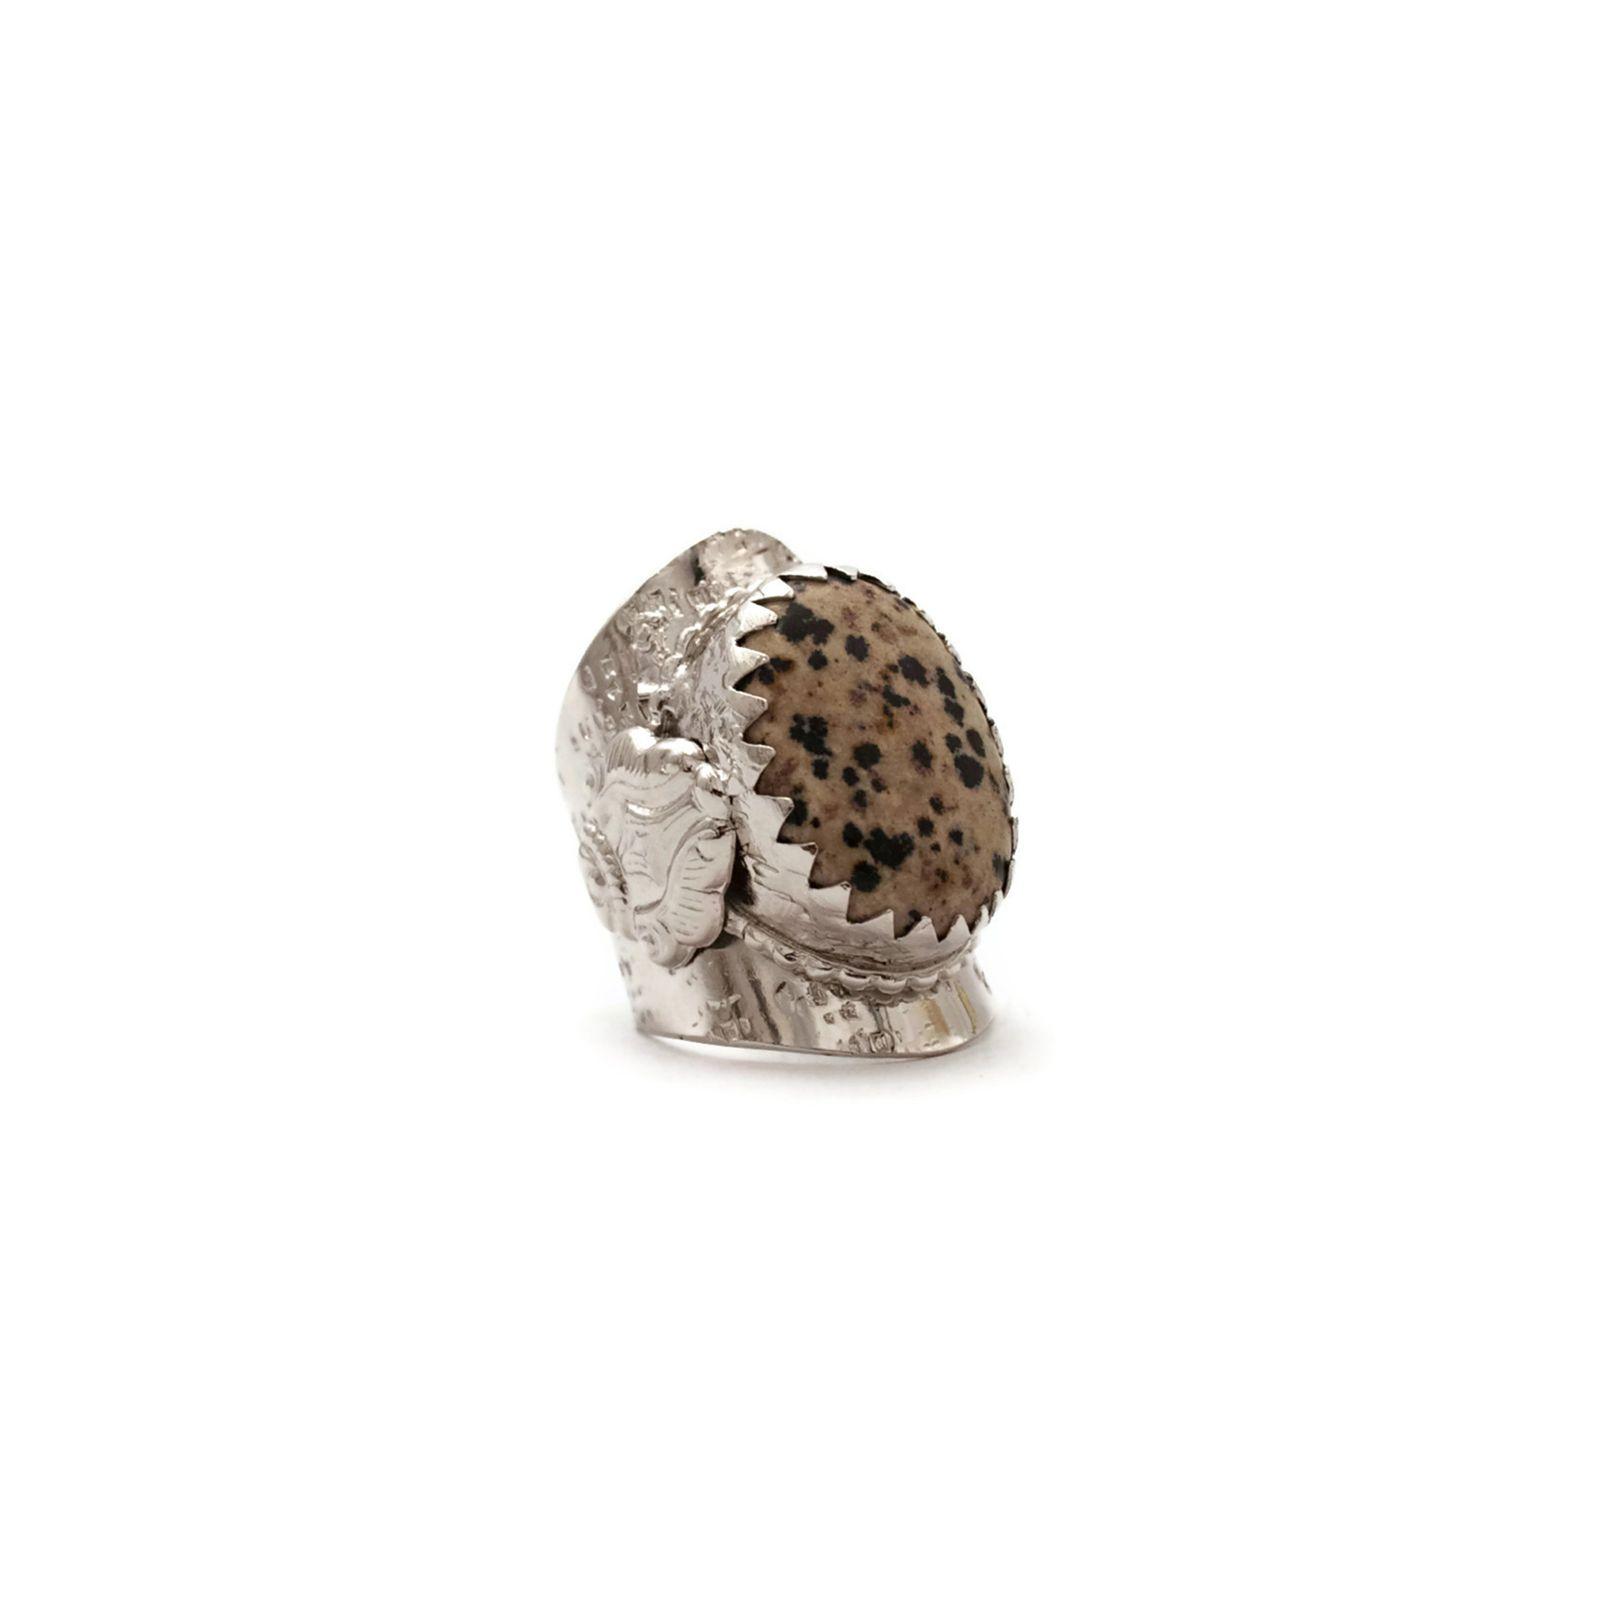 Am liking this Dalmatian jasper Ava ring @LindseyMarieGVA via @Saleservant